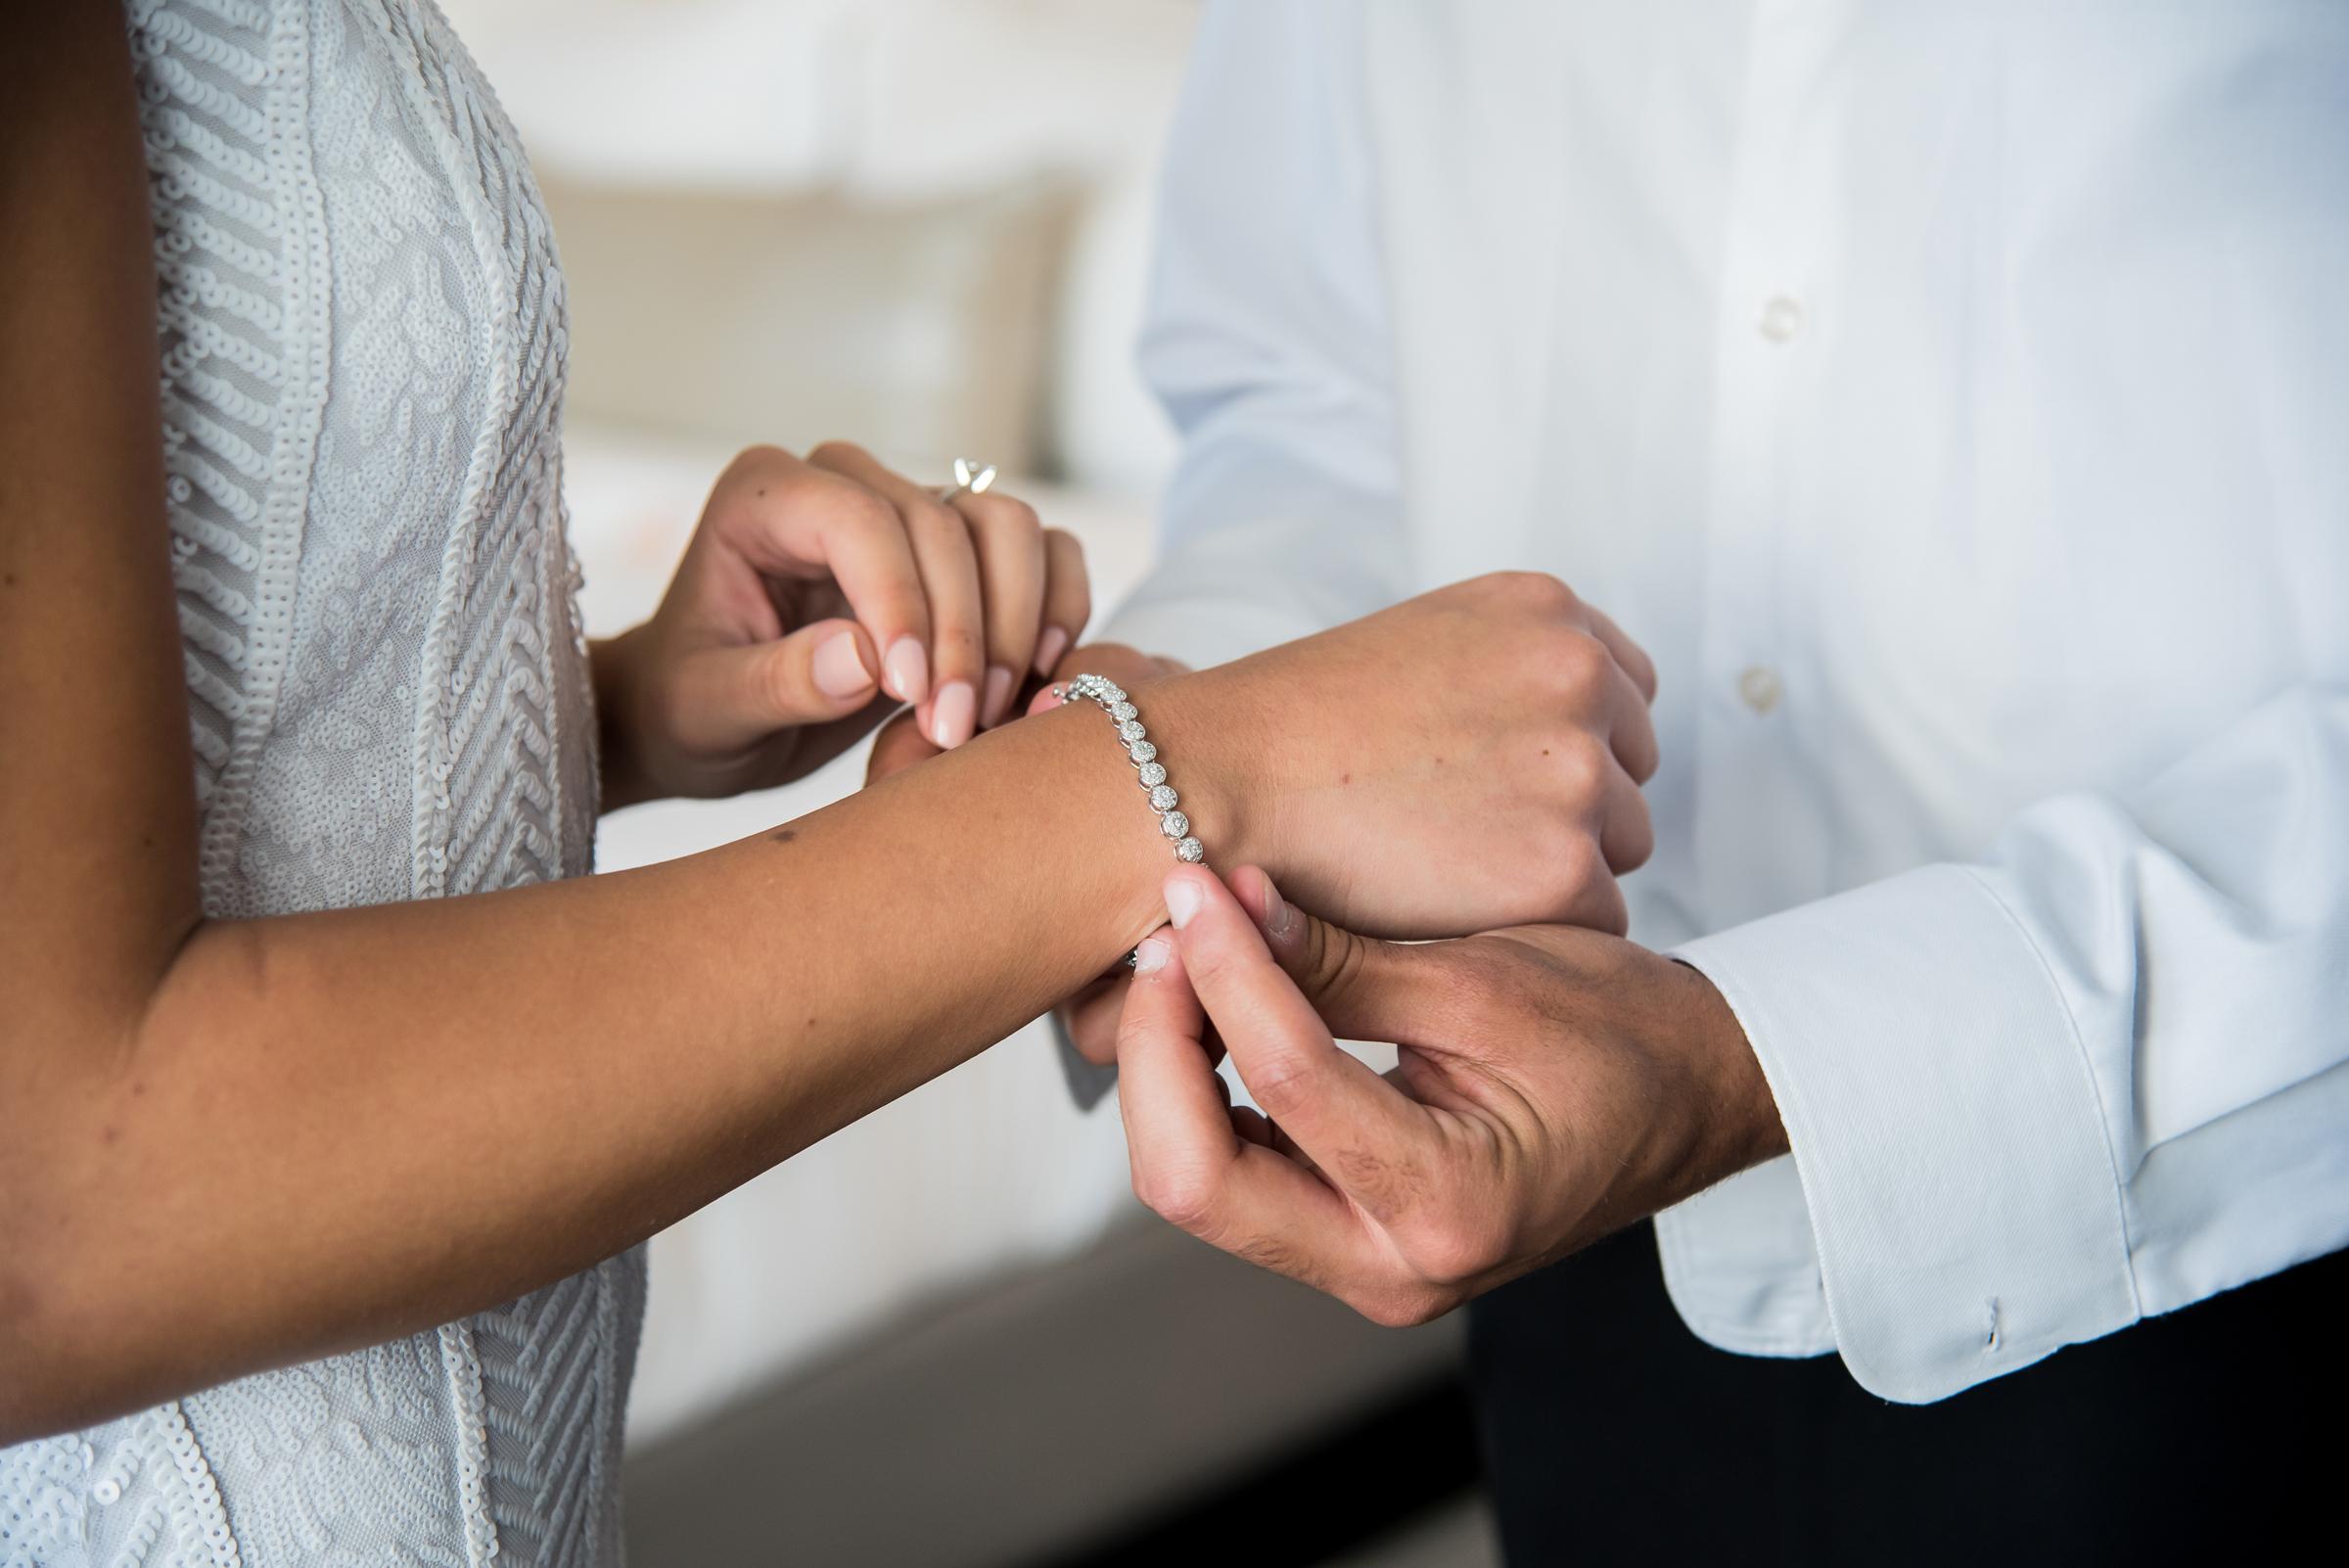 Grooms-Bridesmaid-Groomsman Gift Ideas — The Overwhelmed Bride Wedding Blog